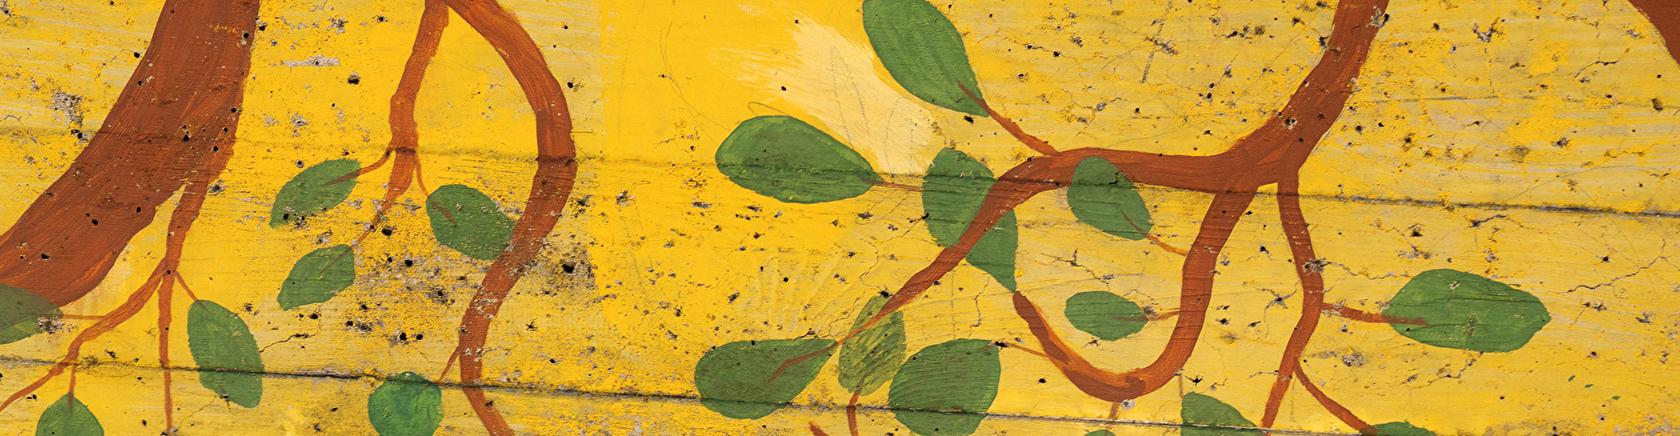 Wandbild Zihl